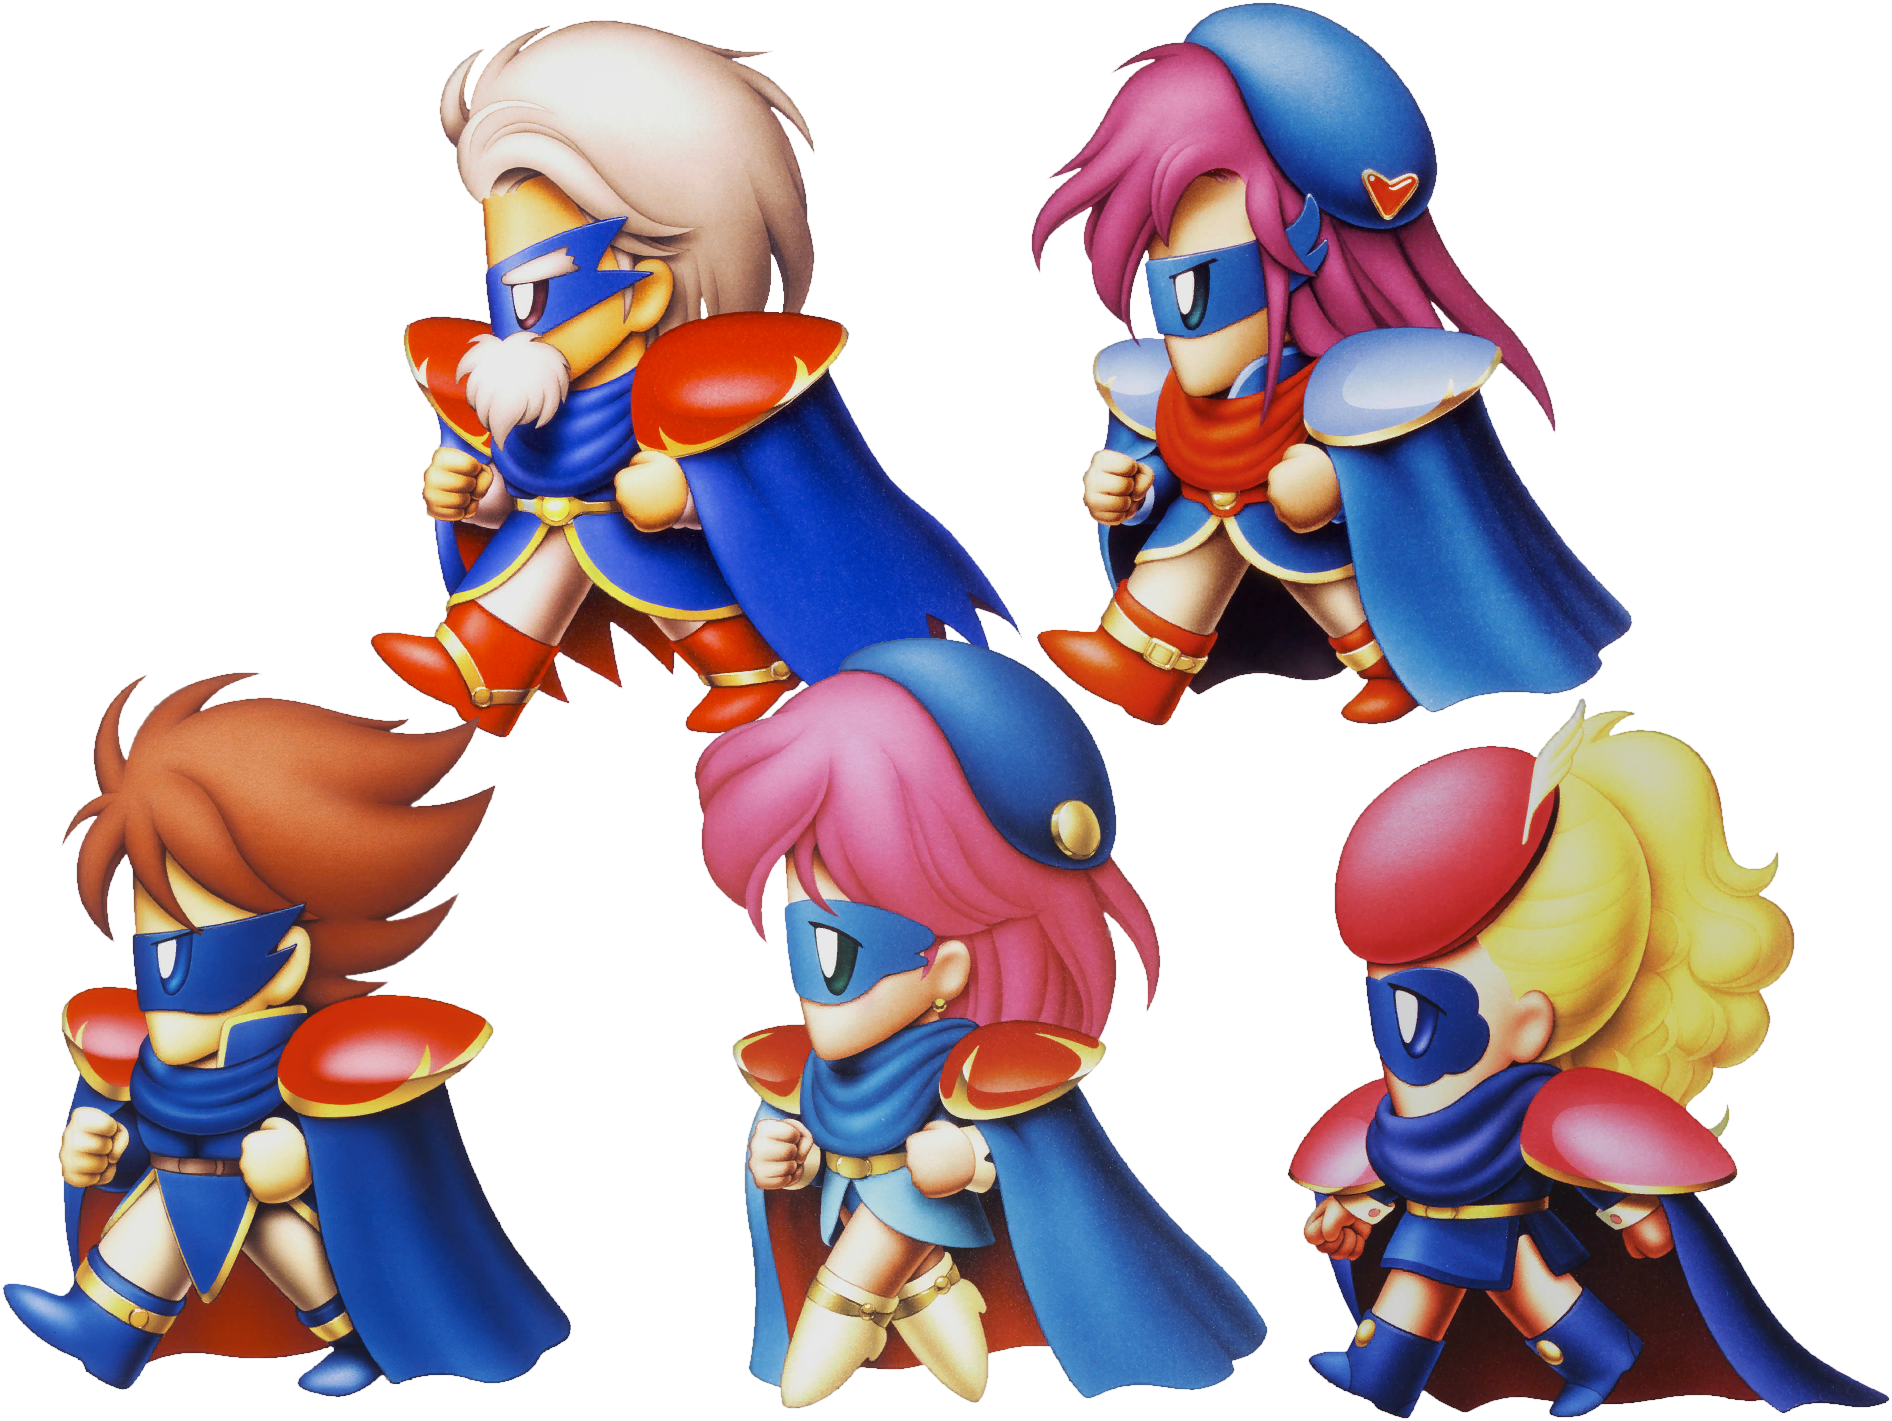 Mago blu (Final Fantasy V)